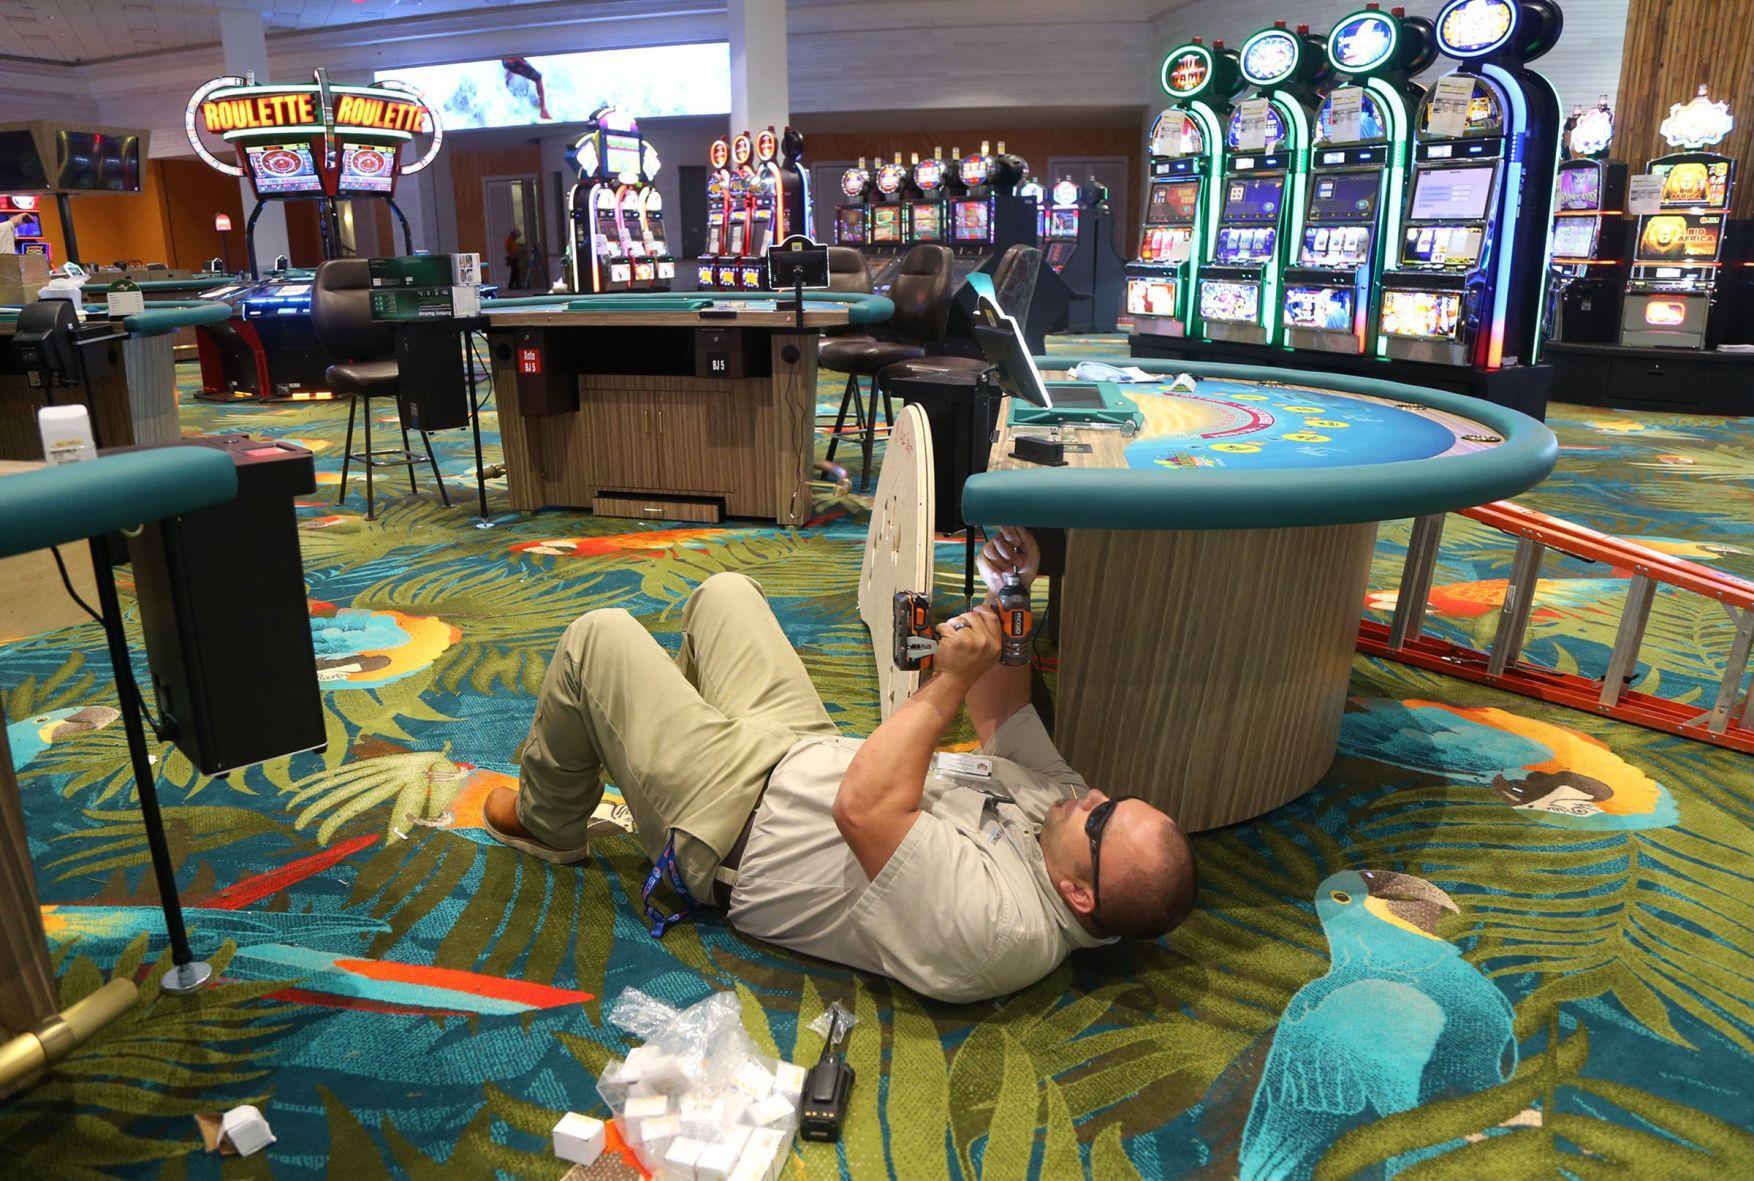 Creek nation casino tulsa gambling toronto canada